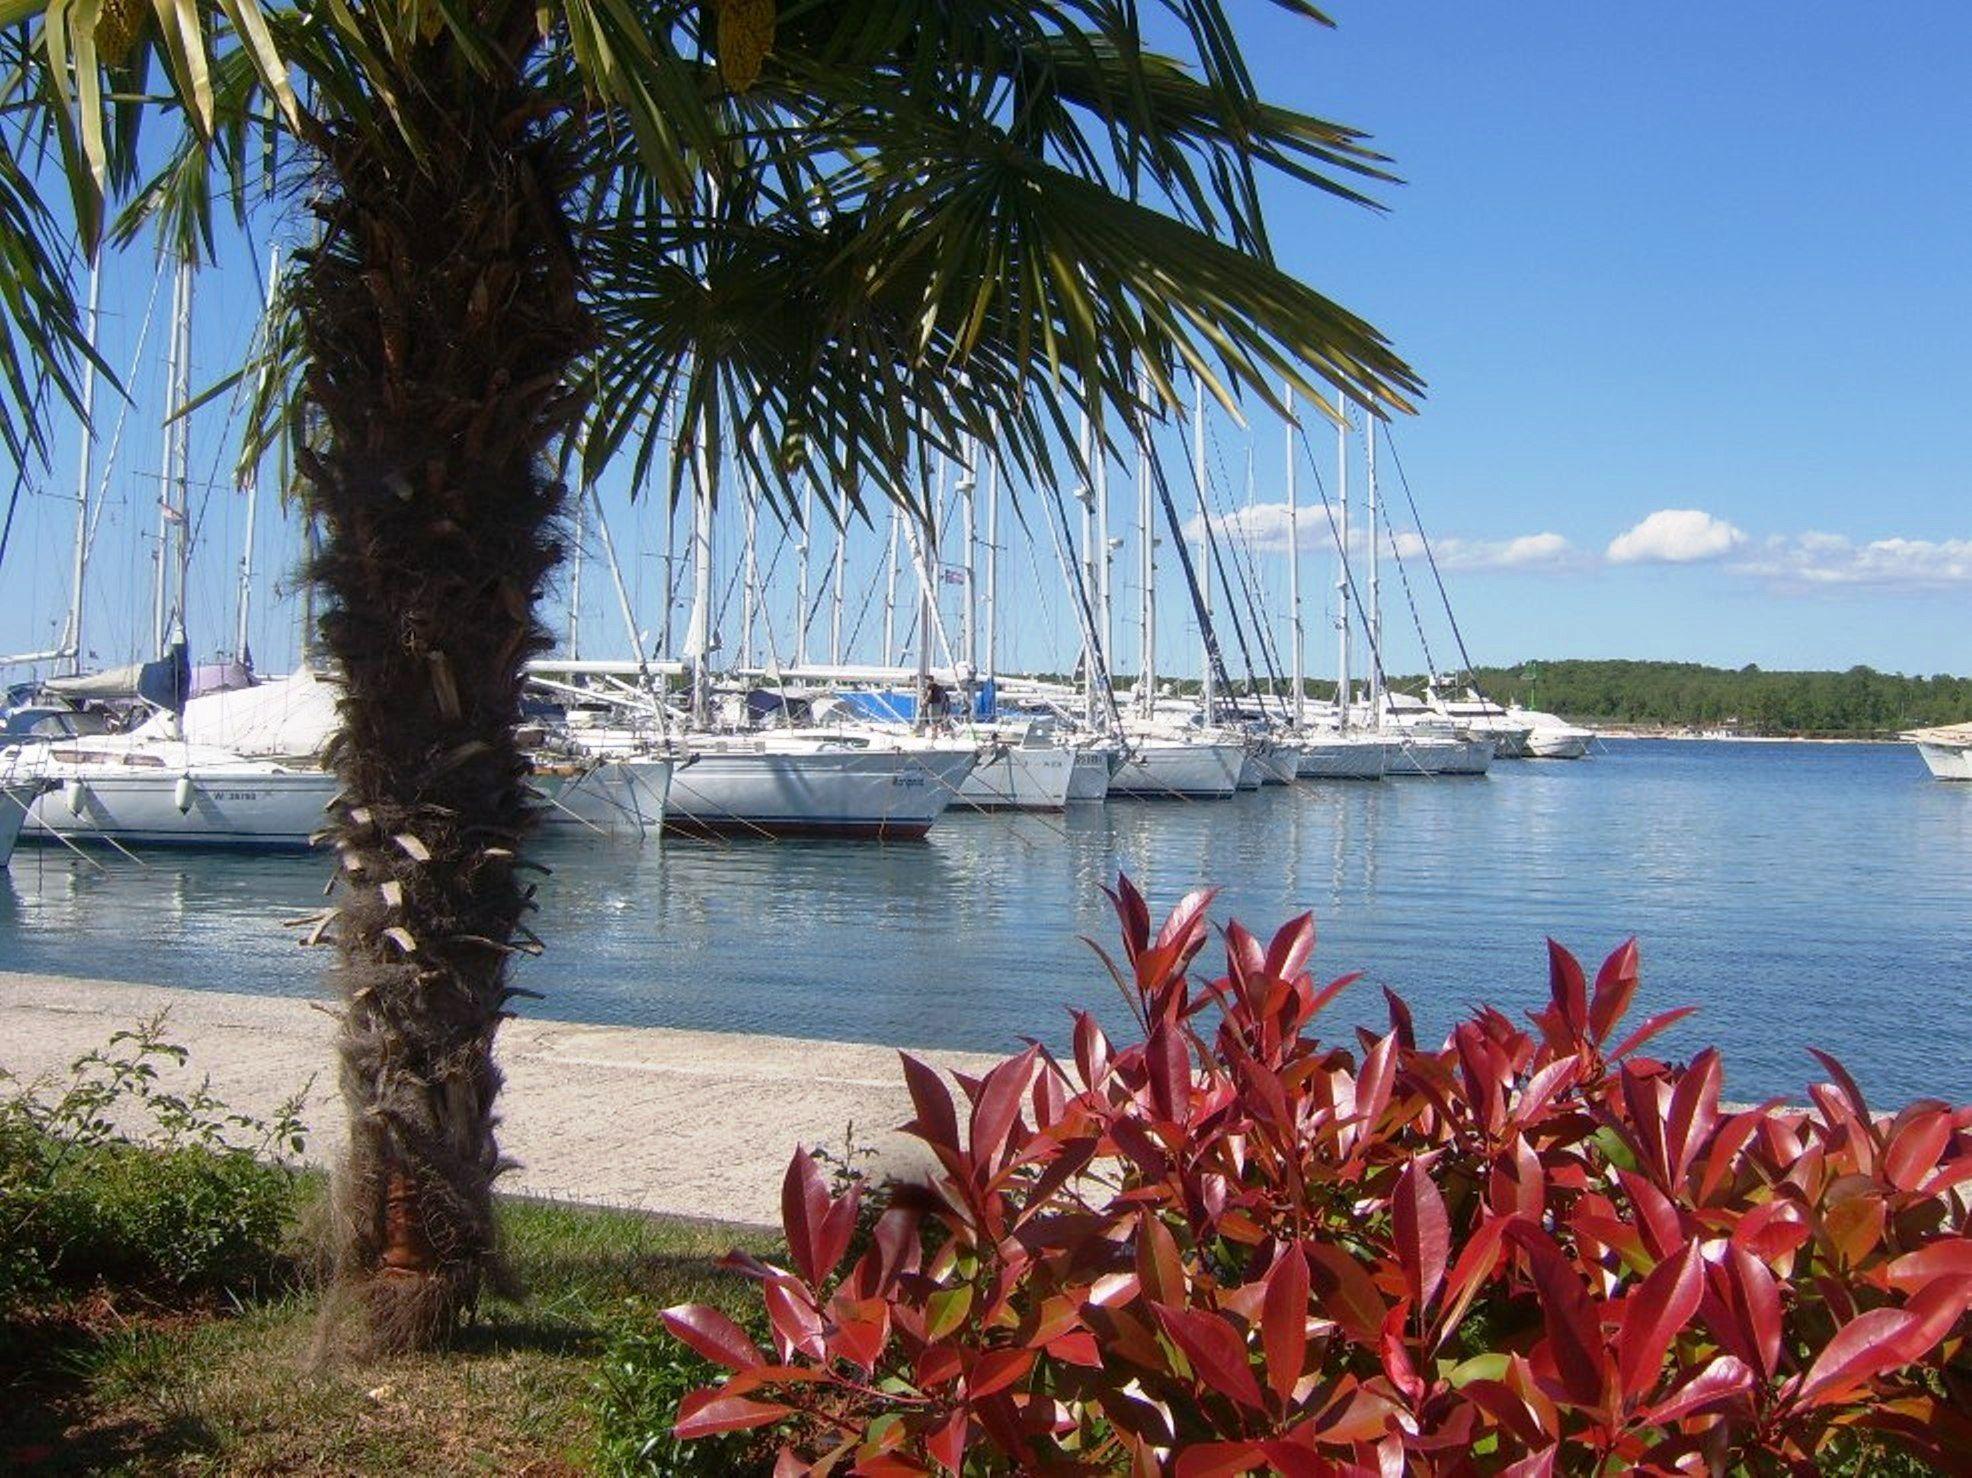 Funtana Harbor Kap Istra Istria Istrien Istra Istrie Croatia Kroatien Kroatie Chorwacja Chorvatsko Croazie Kroatienliebe Istrien Kroatien